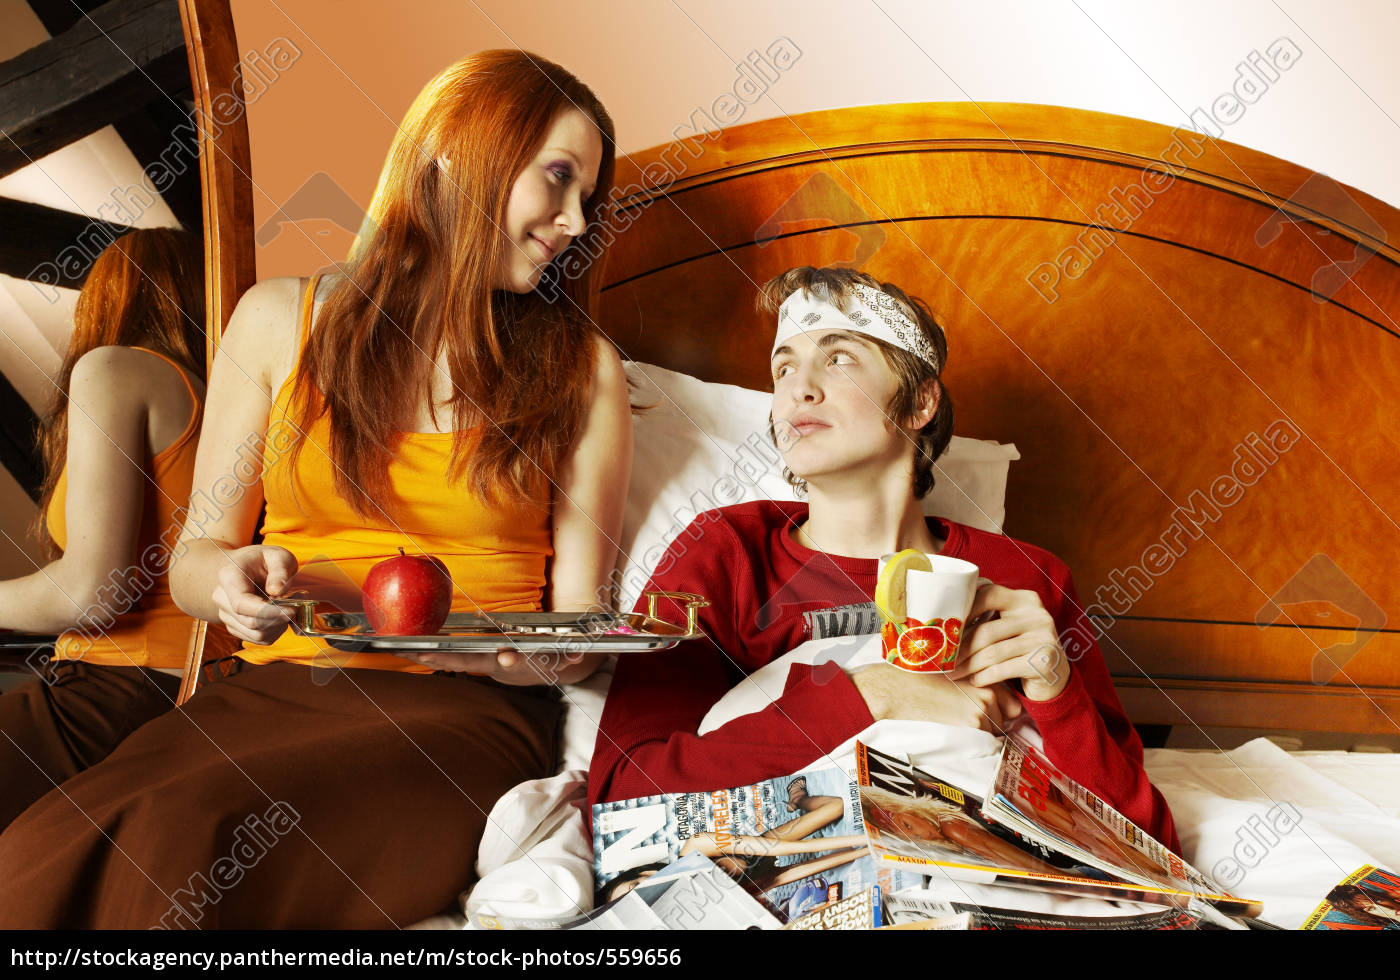 simulant, and, loving, care - 559656